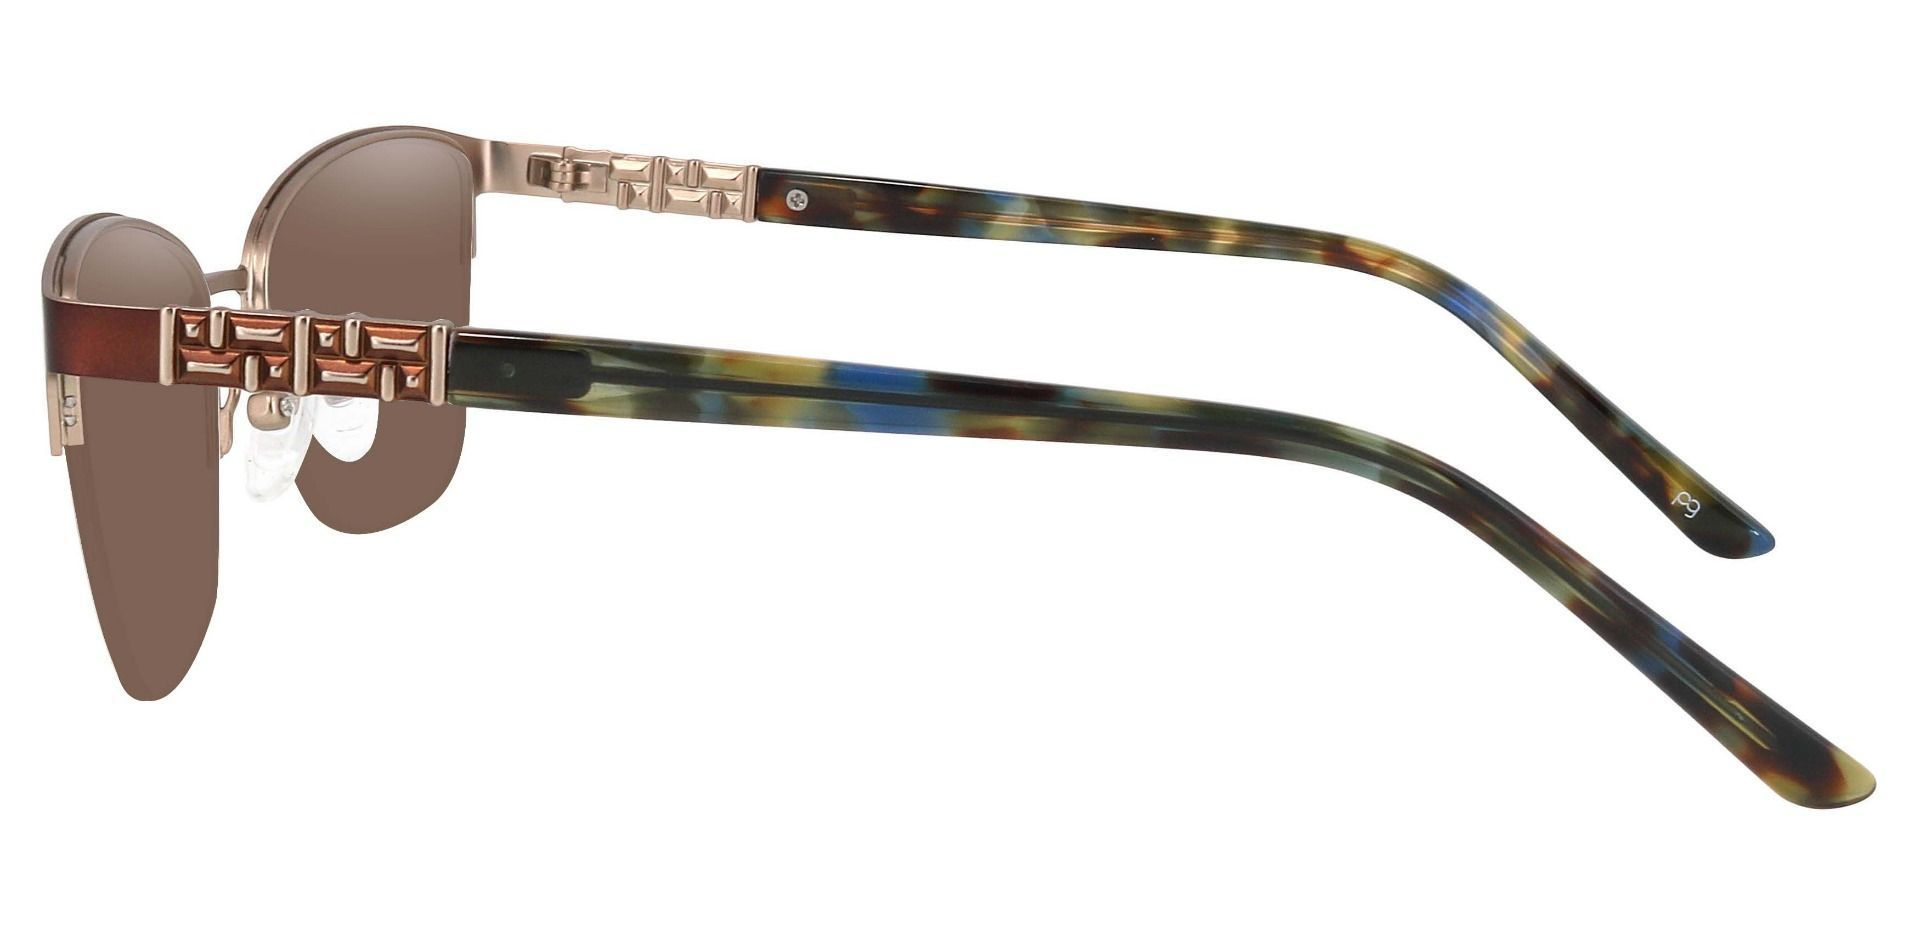 Ballad Cat Eye Prescription Sunglasses - Brown Frame With Brown Lenses